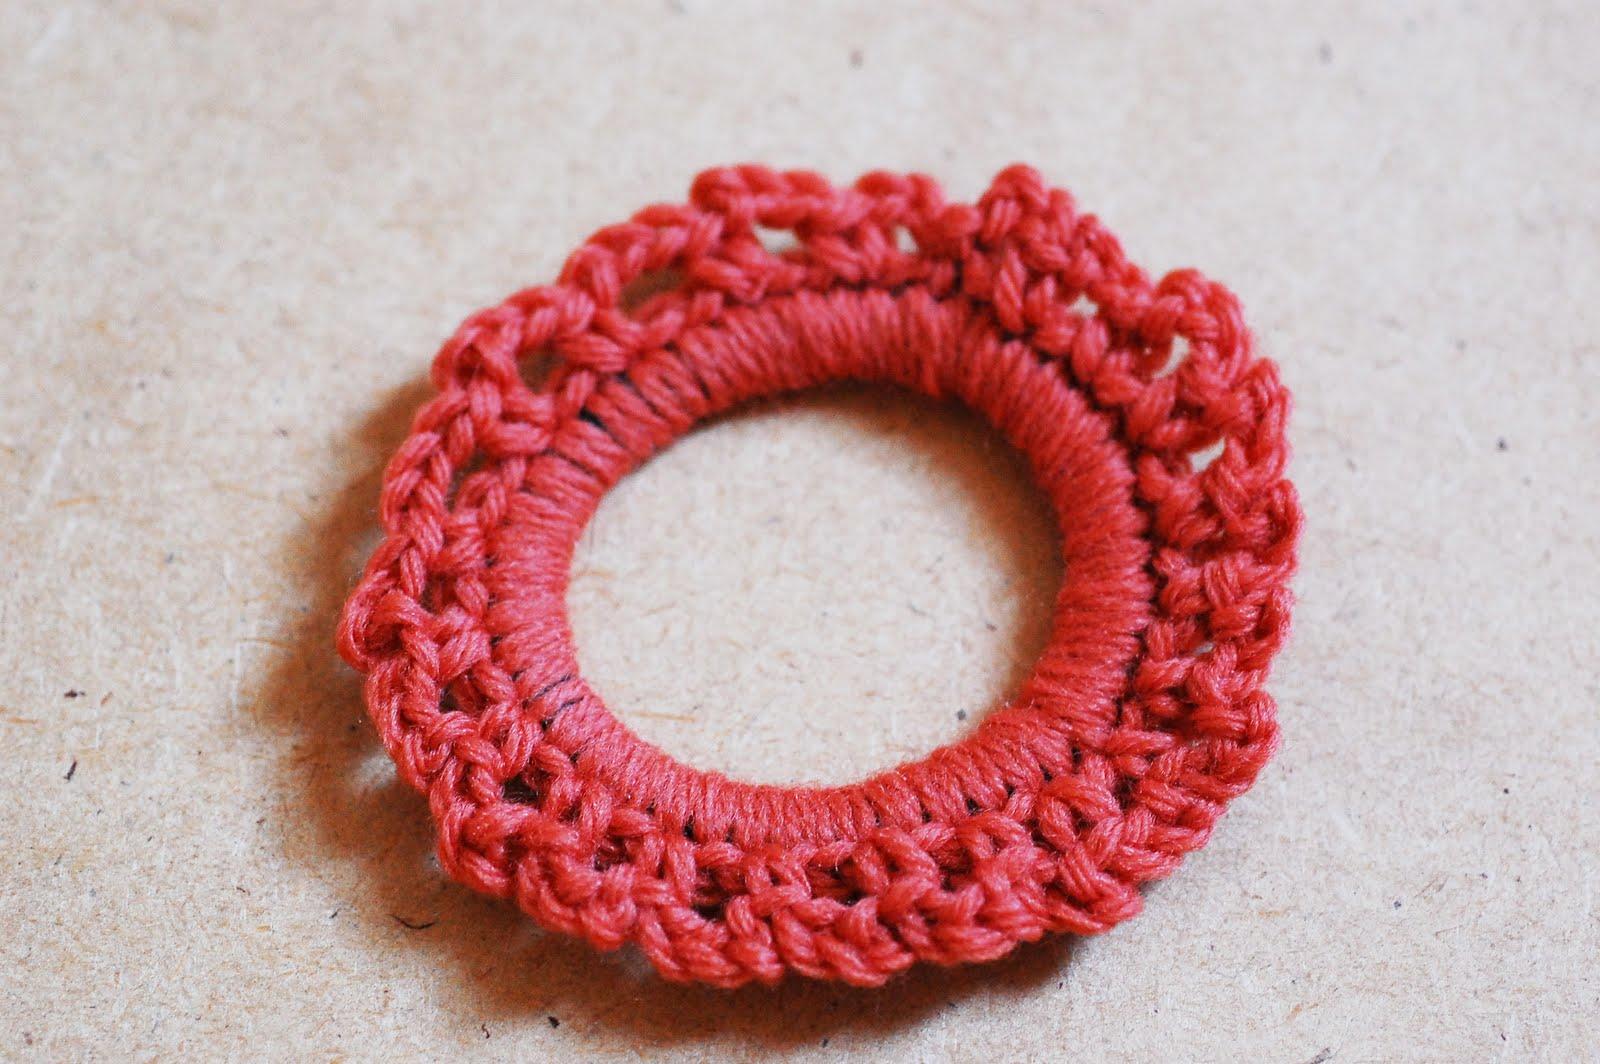 Maize Hutton: The Crocheted Scrunchie Tutorial!